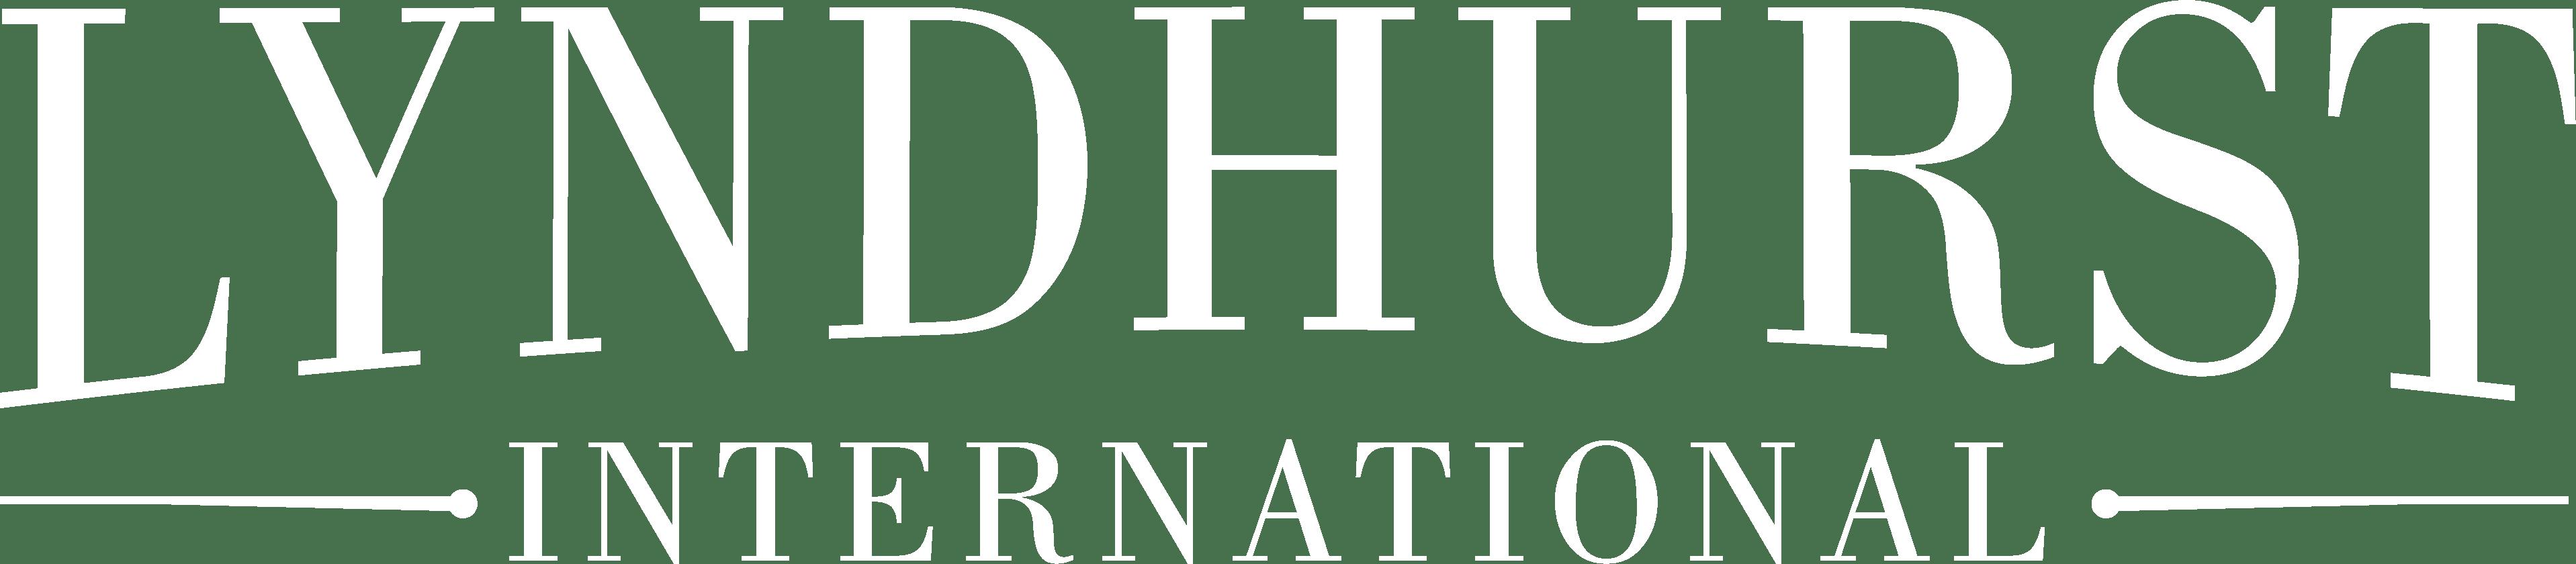 Lyndhurst International